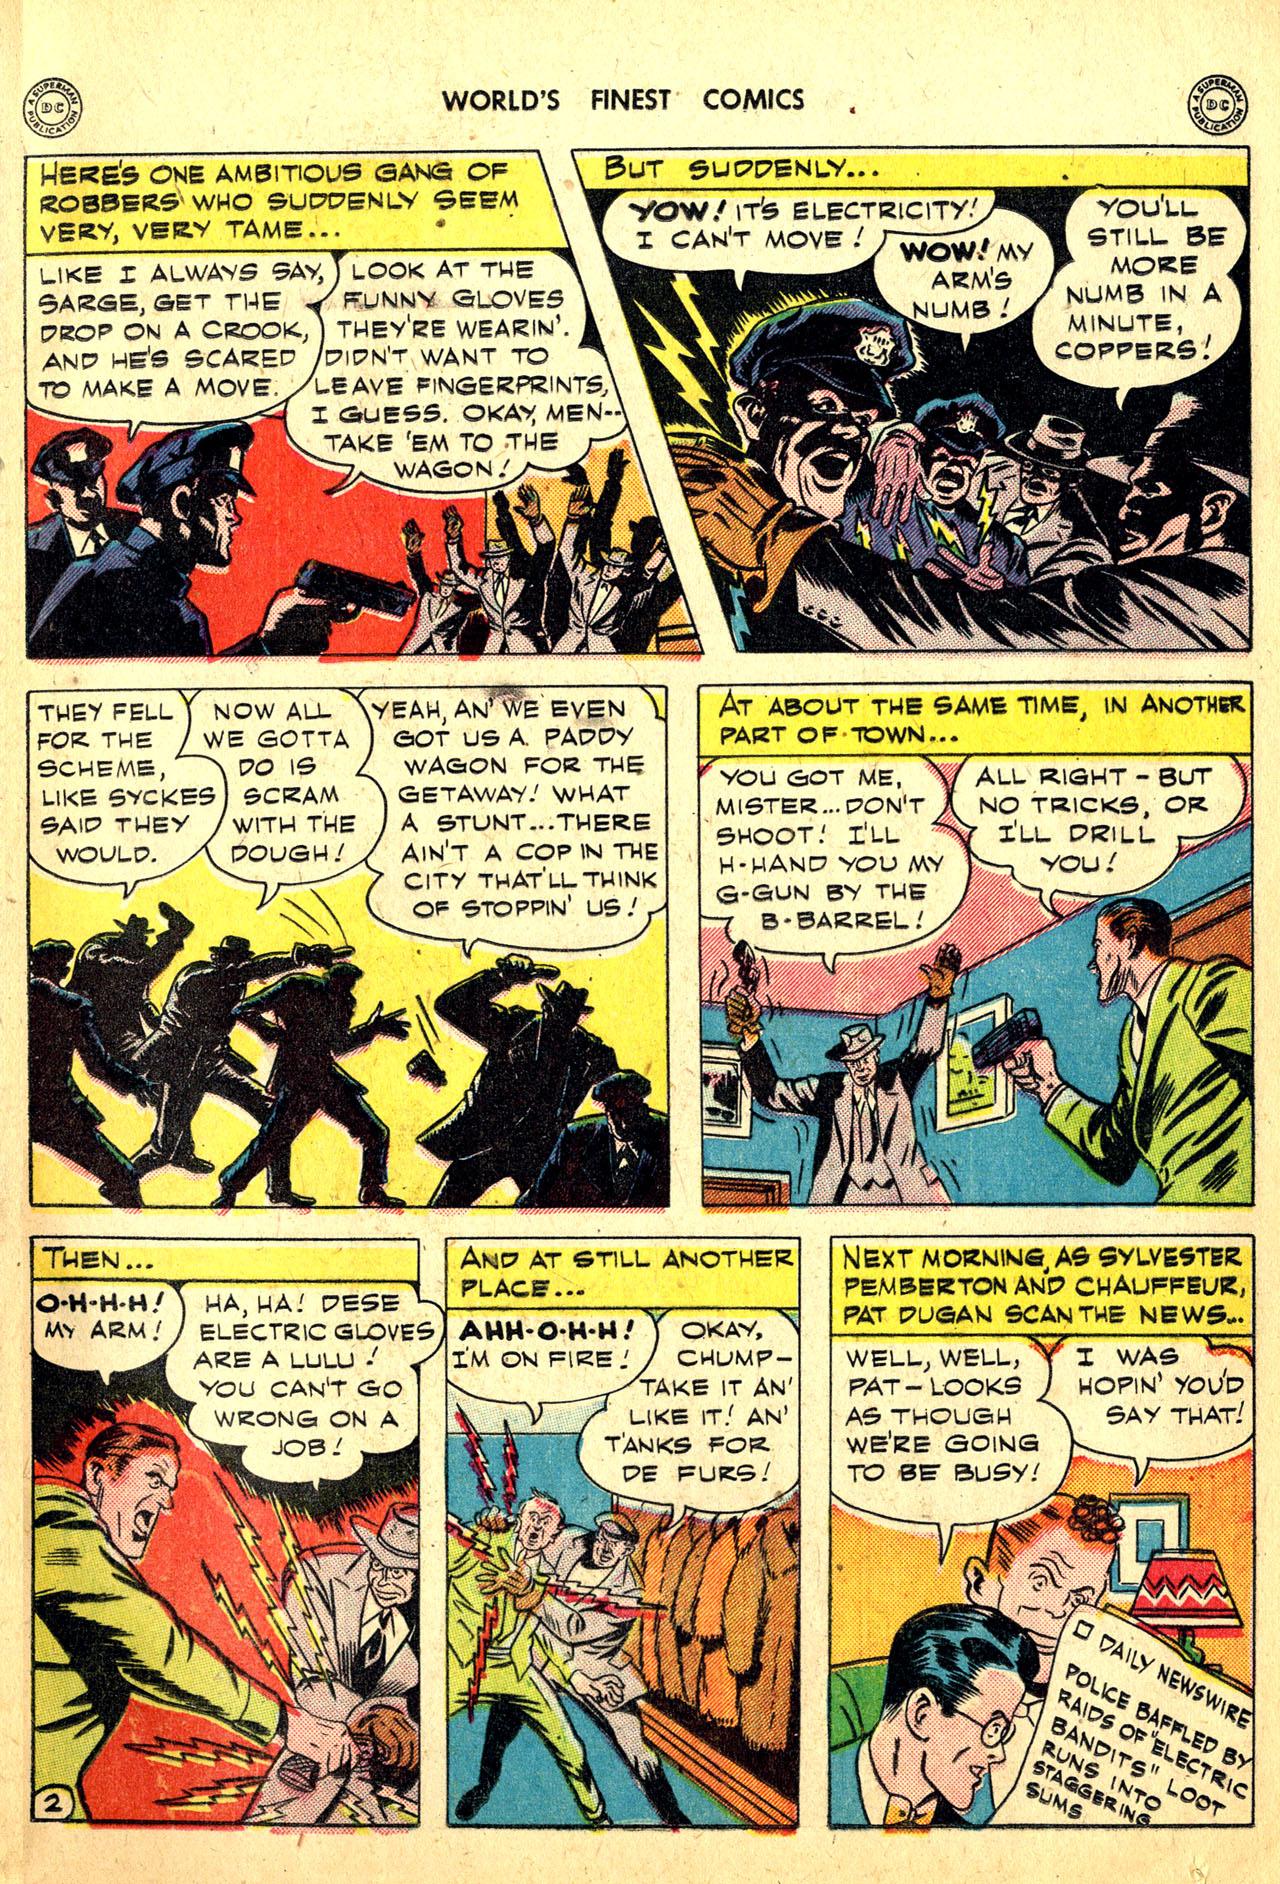 Read online World's Finest Comics comic -  Issue #18 - 17